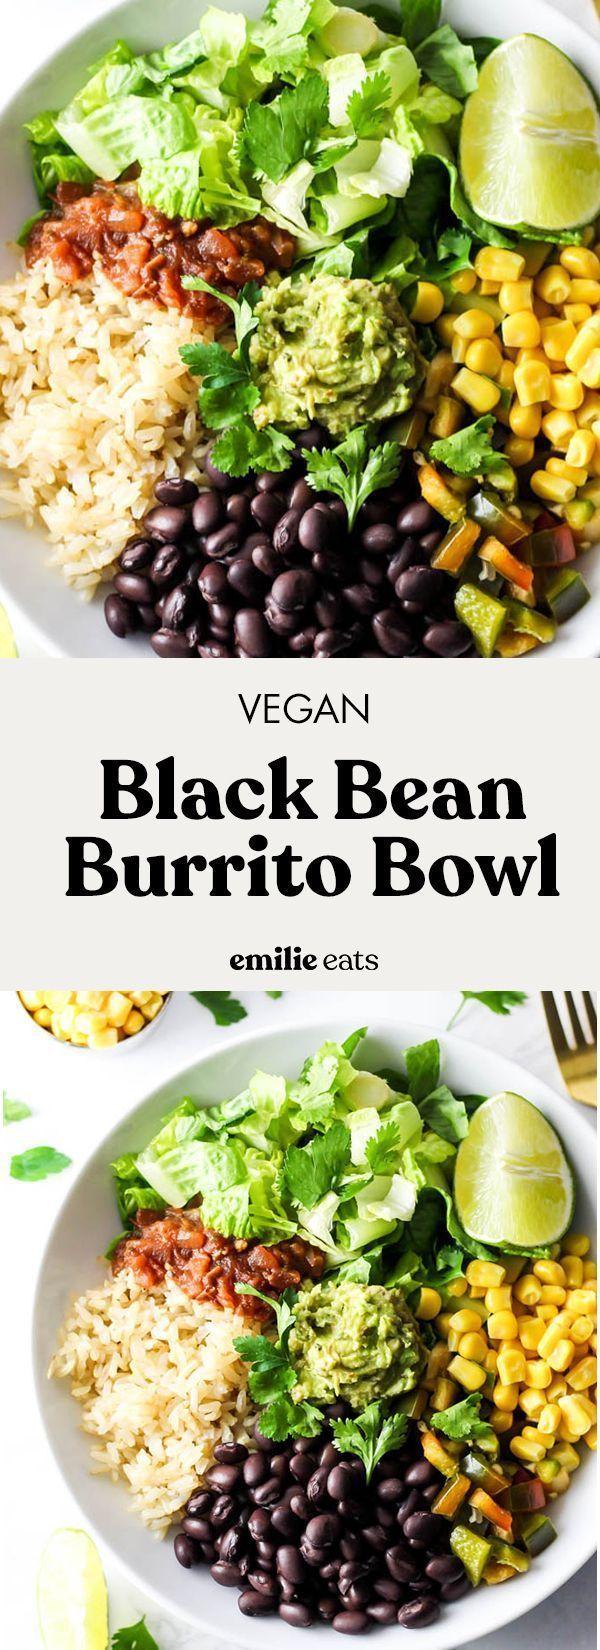 Photo of Vegan Burrito Bowl – Emilie eats, #Bowl #Burrito #simple dishesvegetarian #Emilie # eats …